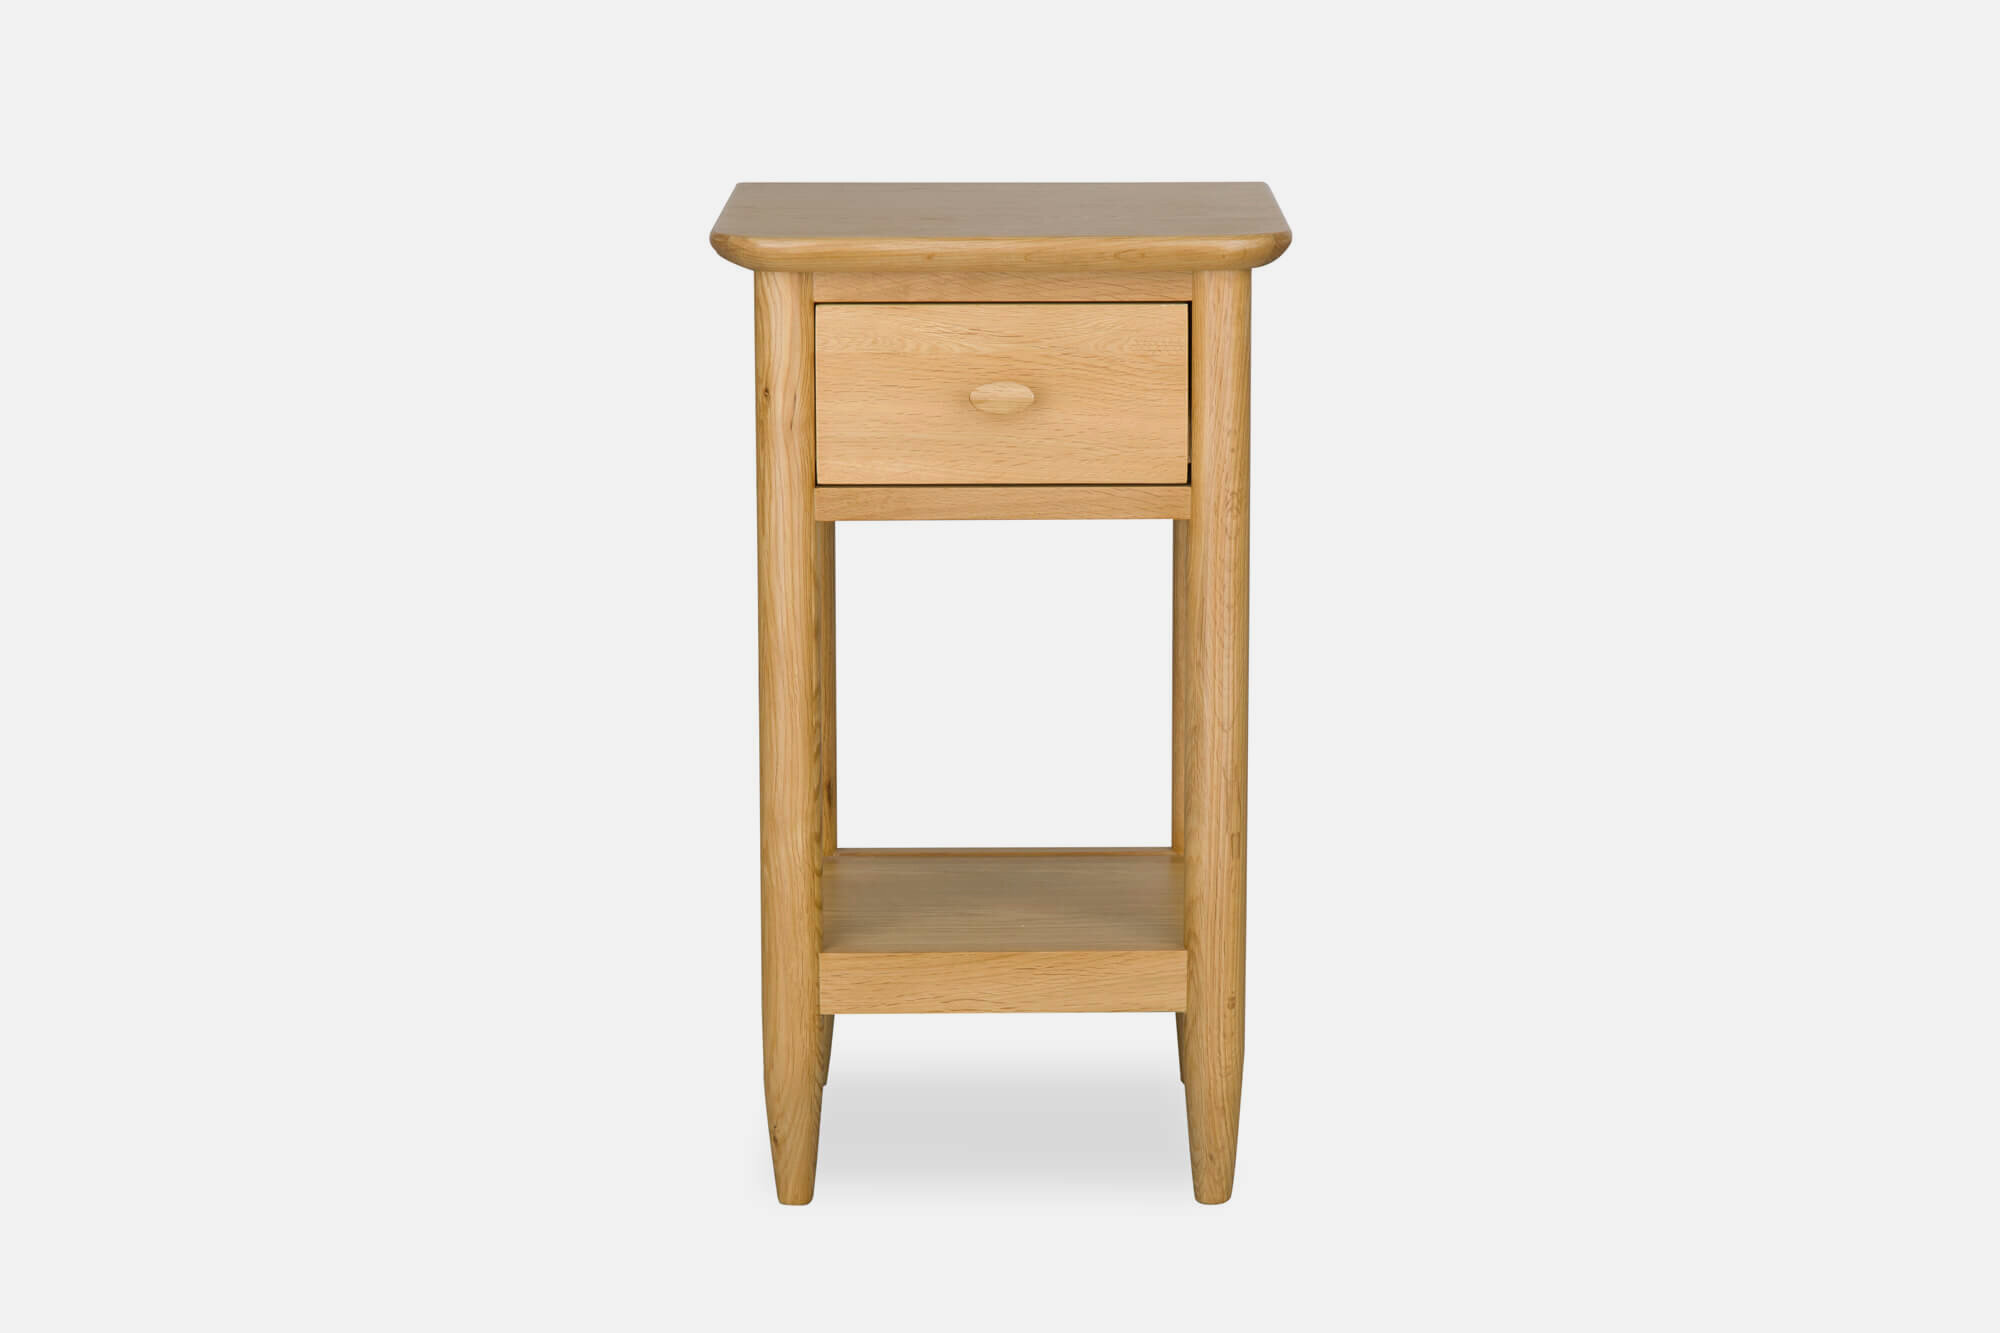 competitive price 4a177 b57eb 'Teramo' Compact Bedside Cabinet – Ercol — GOODFORM